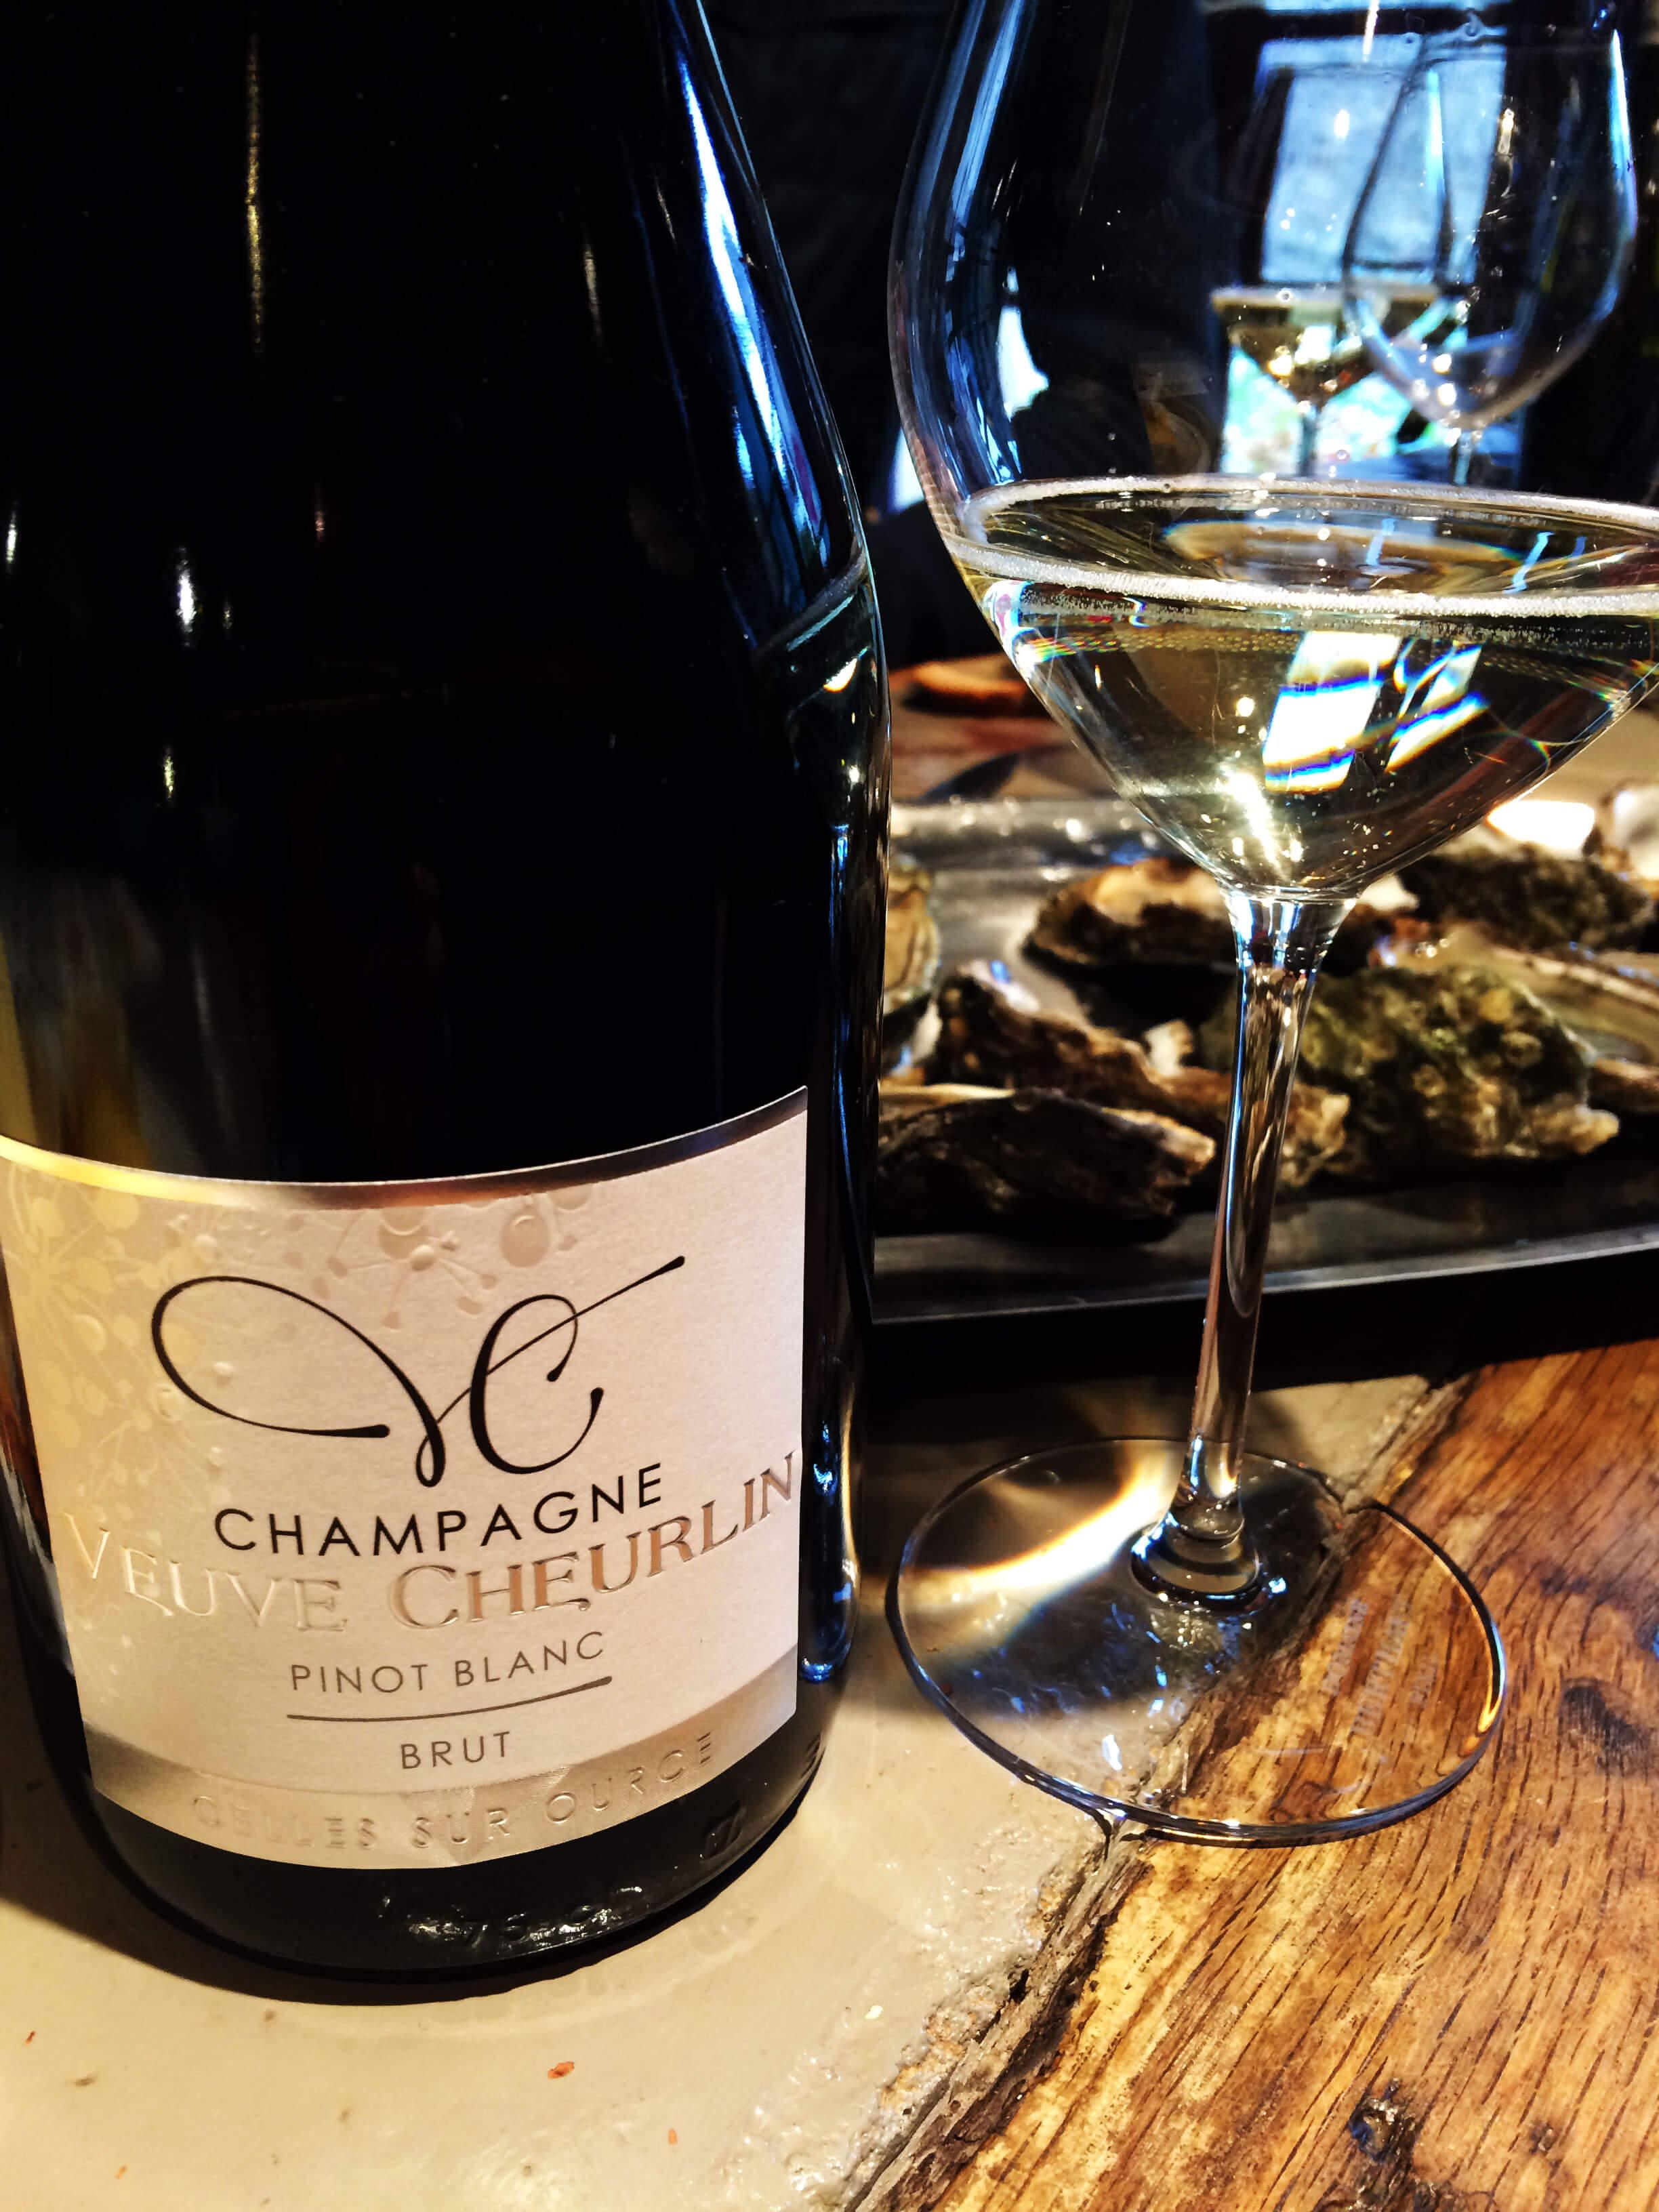 Champagne Veuve Cheurlin - cuvée Pinot Blanc